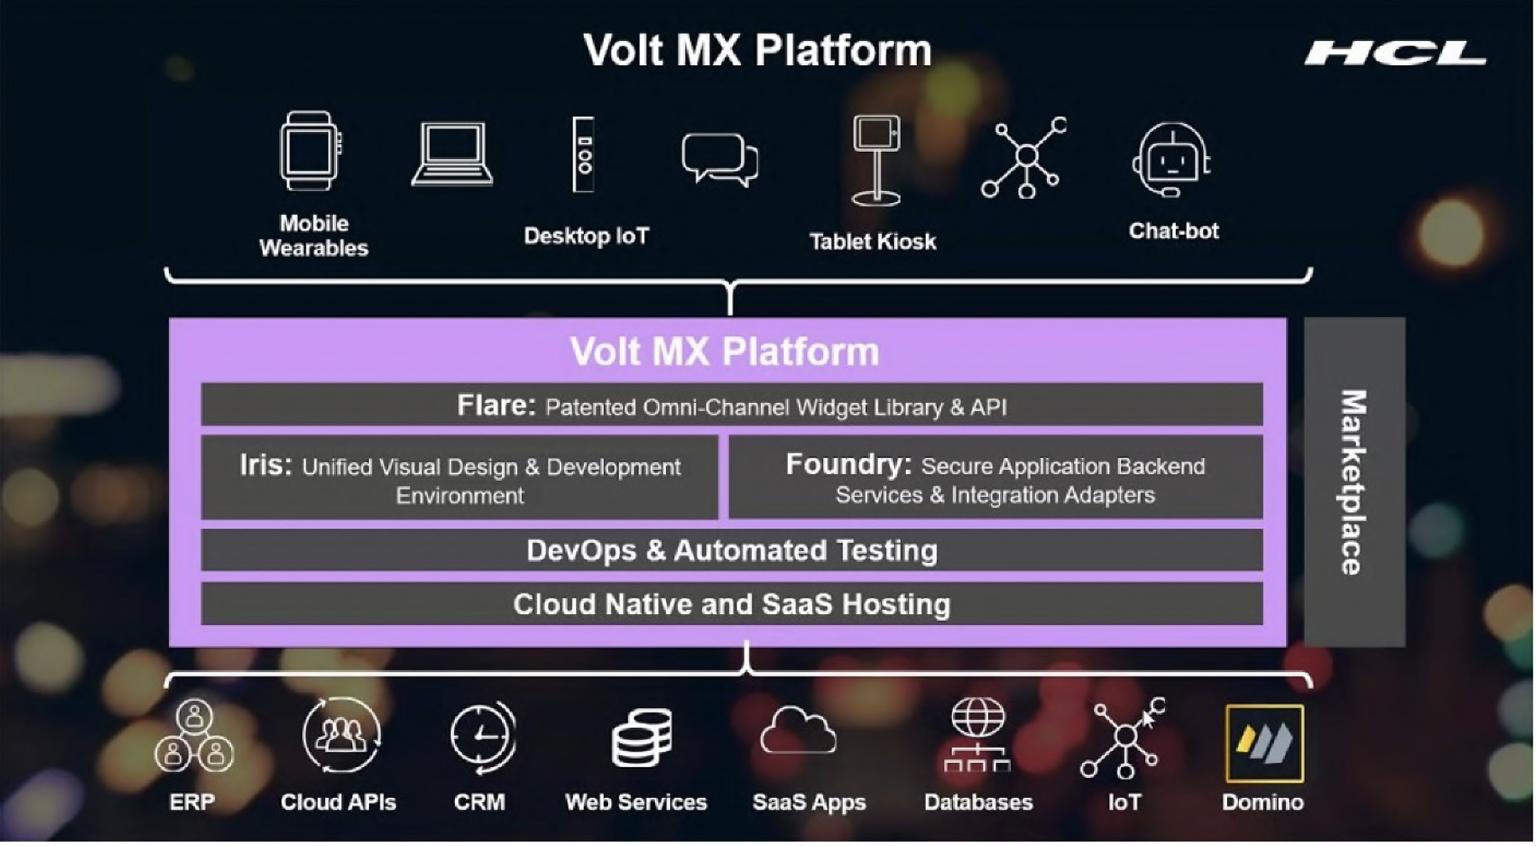 Volt MX Platform